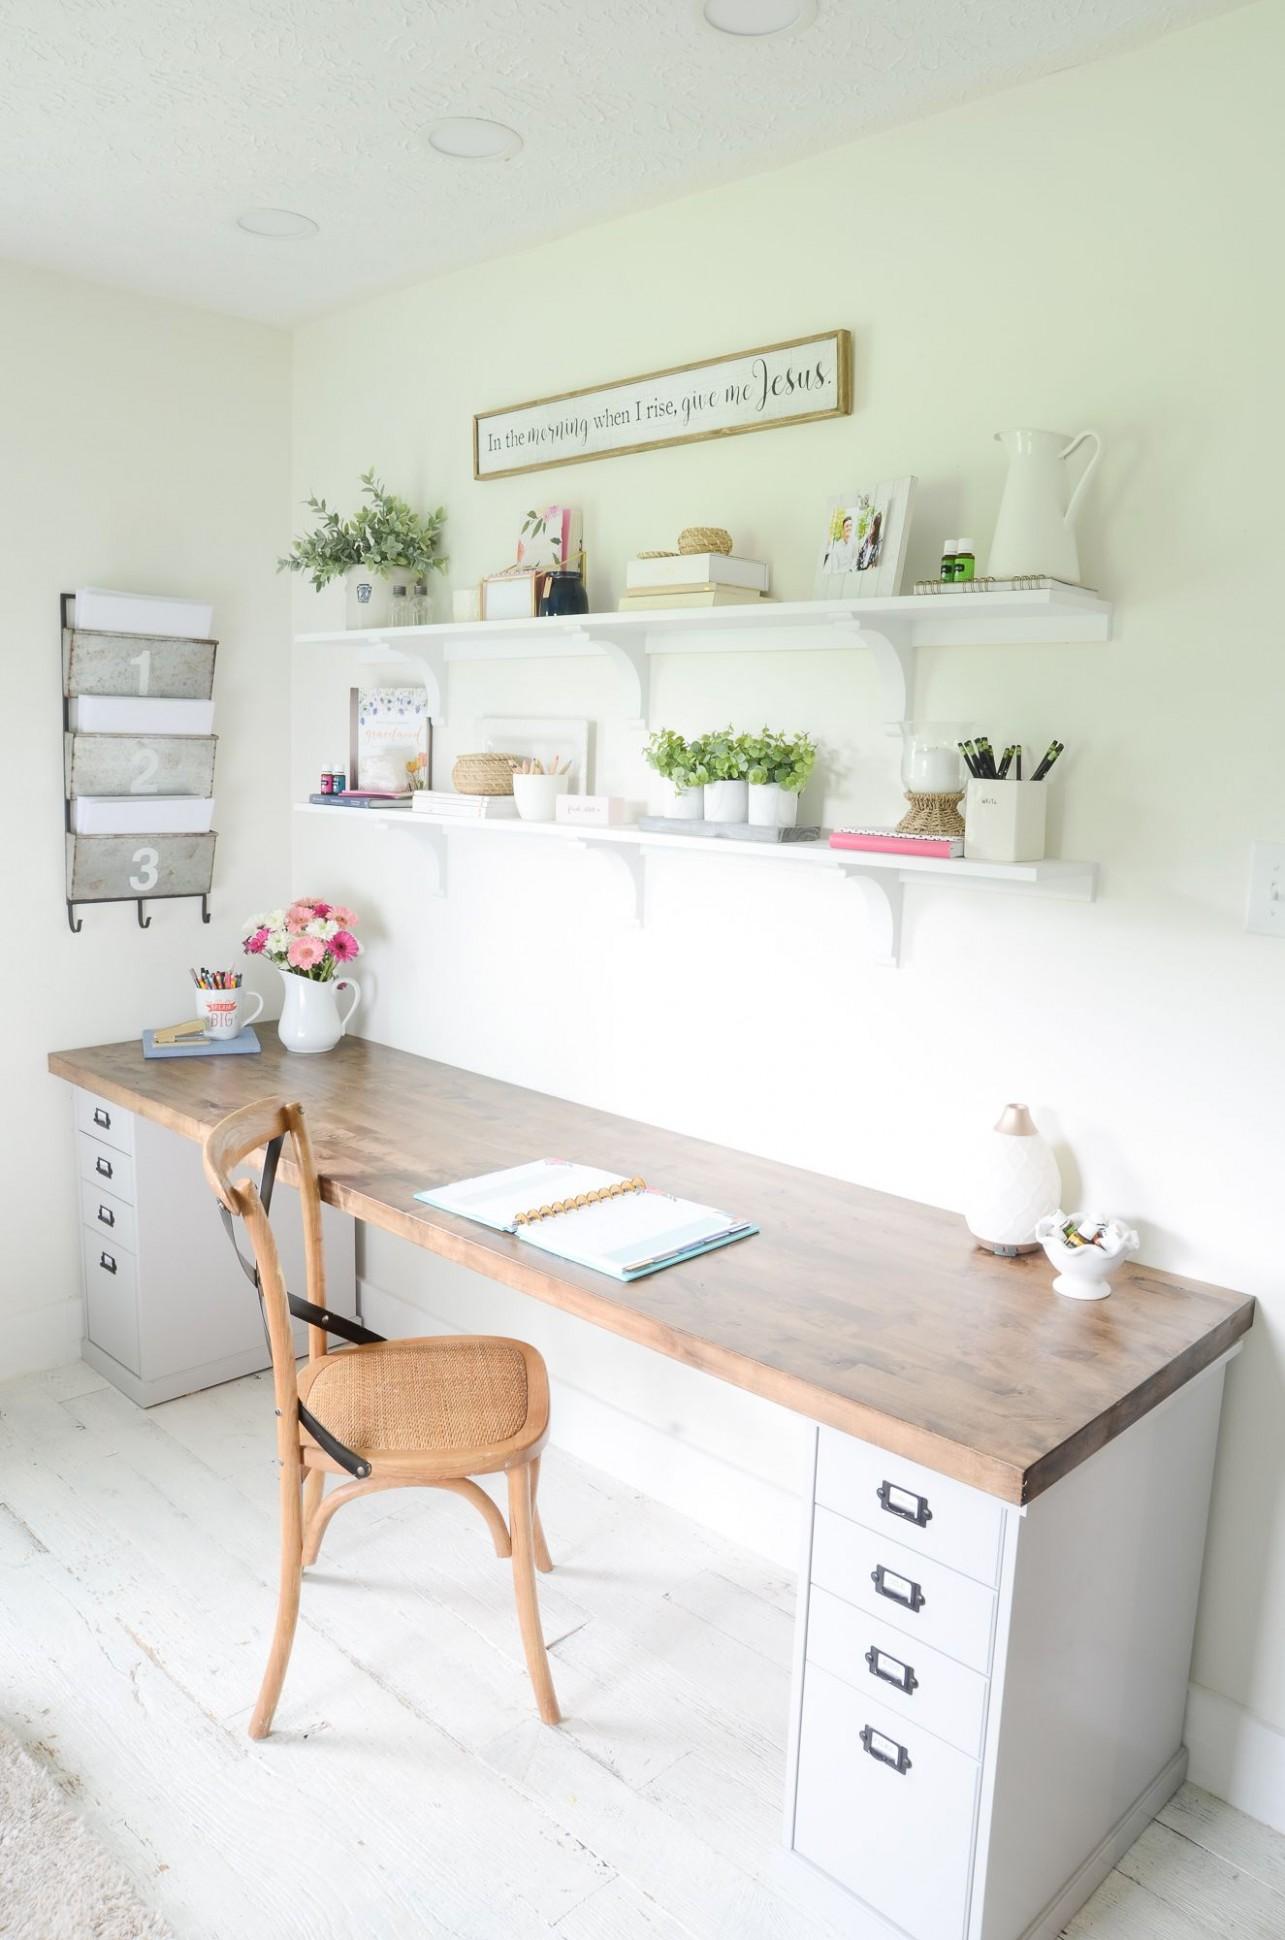 DIY Butcher Block Desk for my Home Office - Beneath My Heart  - Home Office Table Ideas